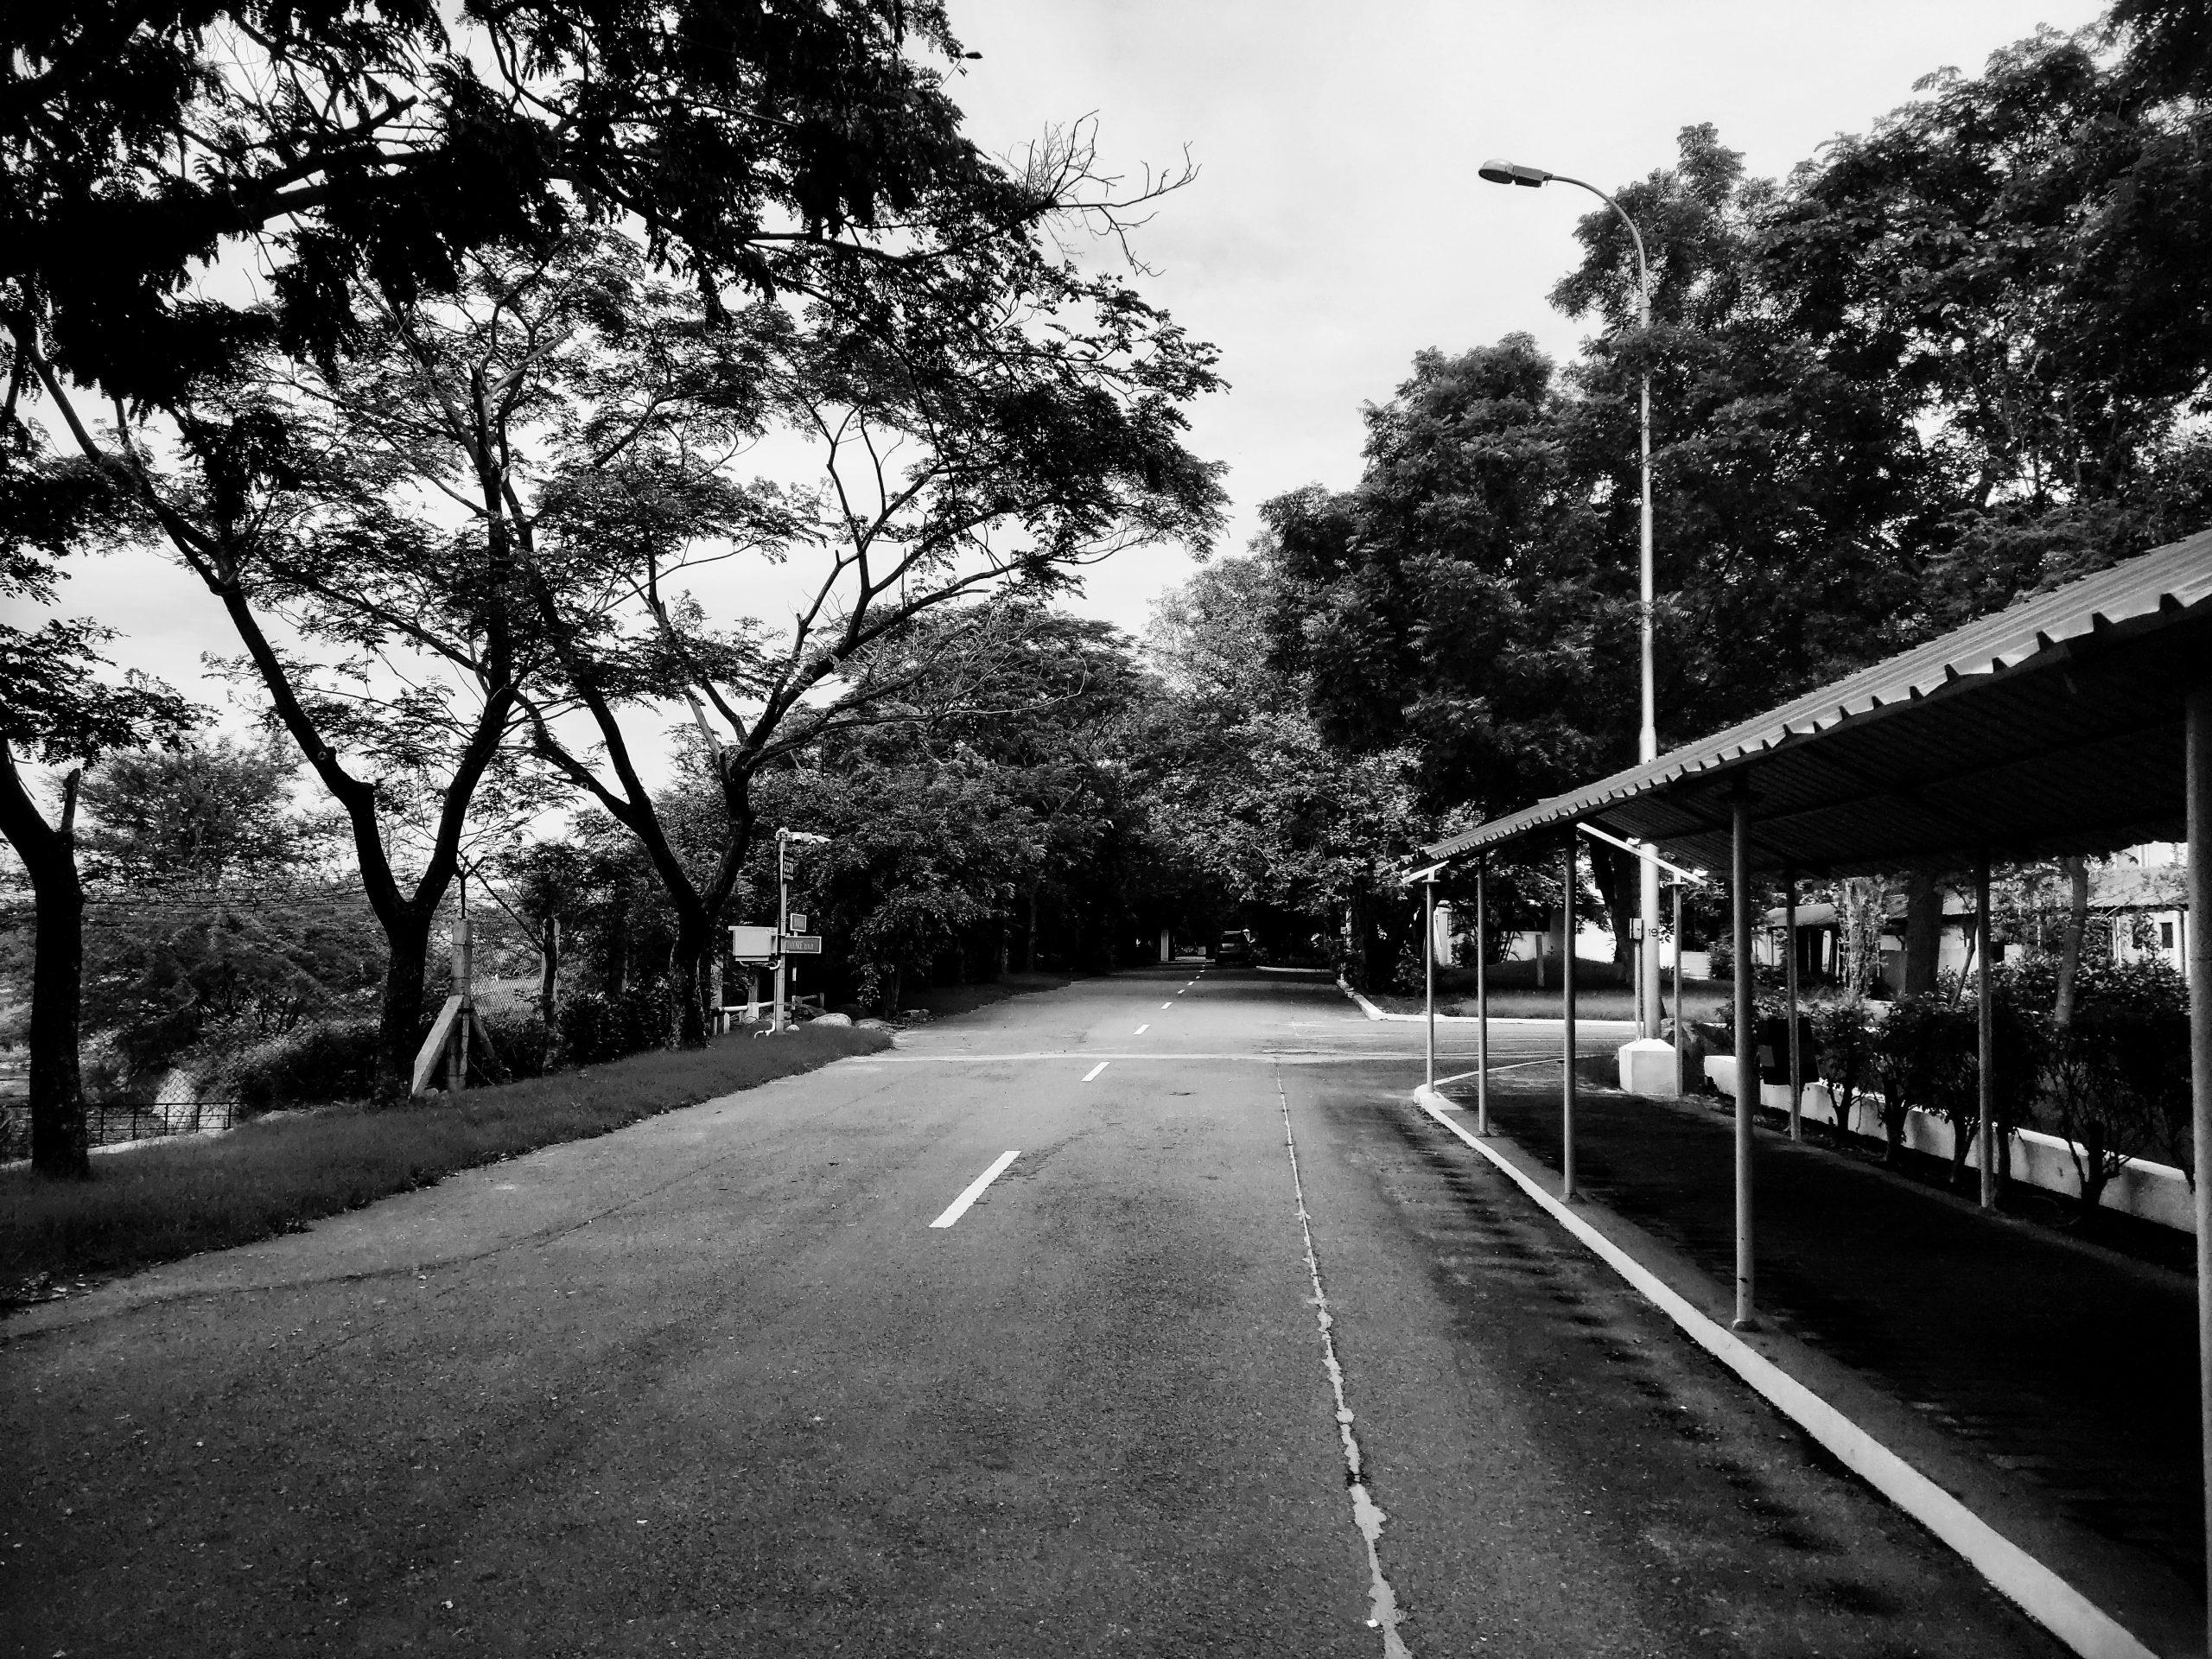 the path among trees